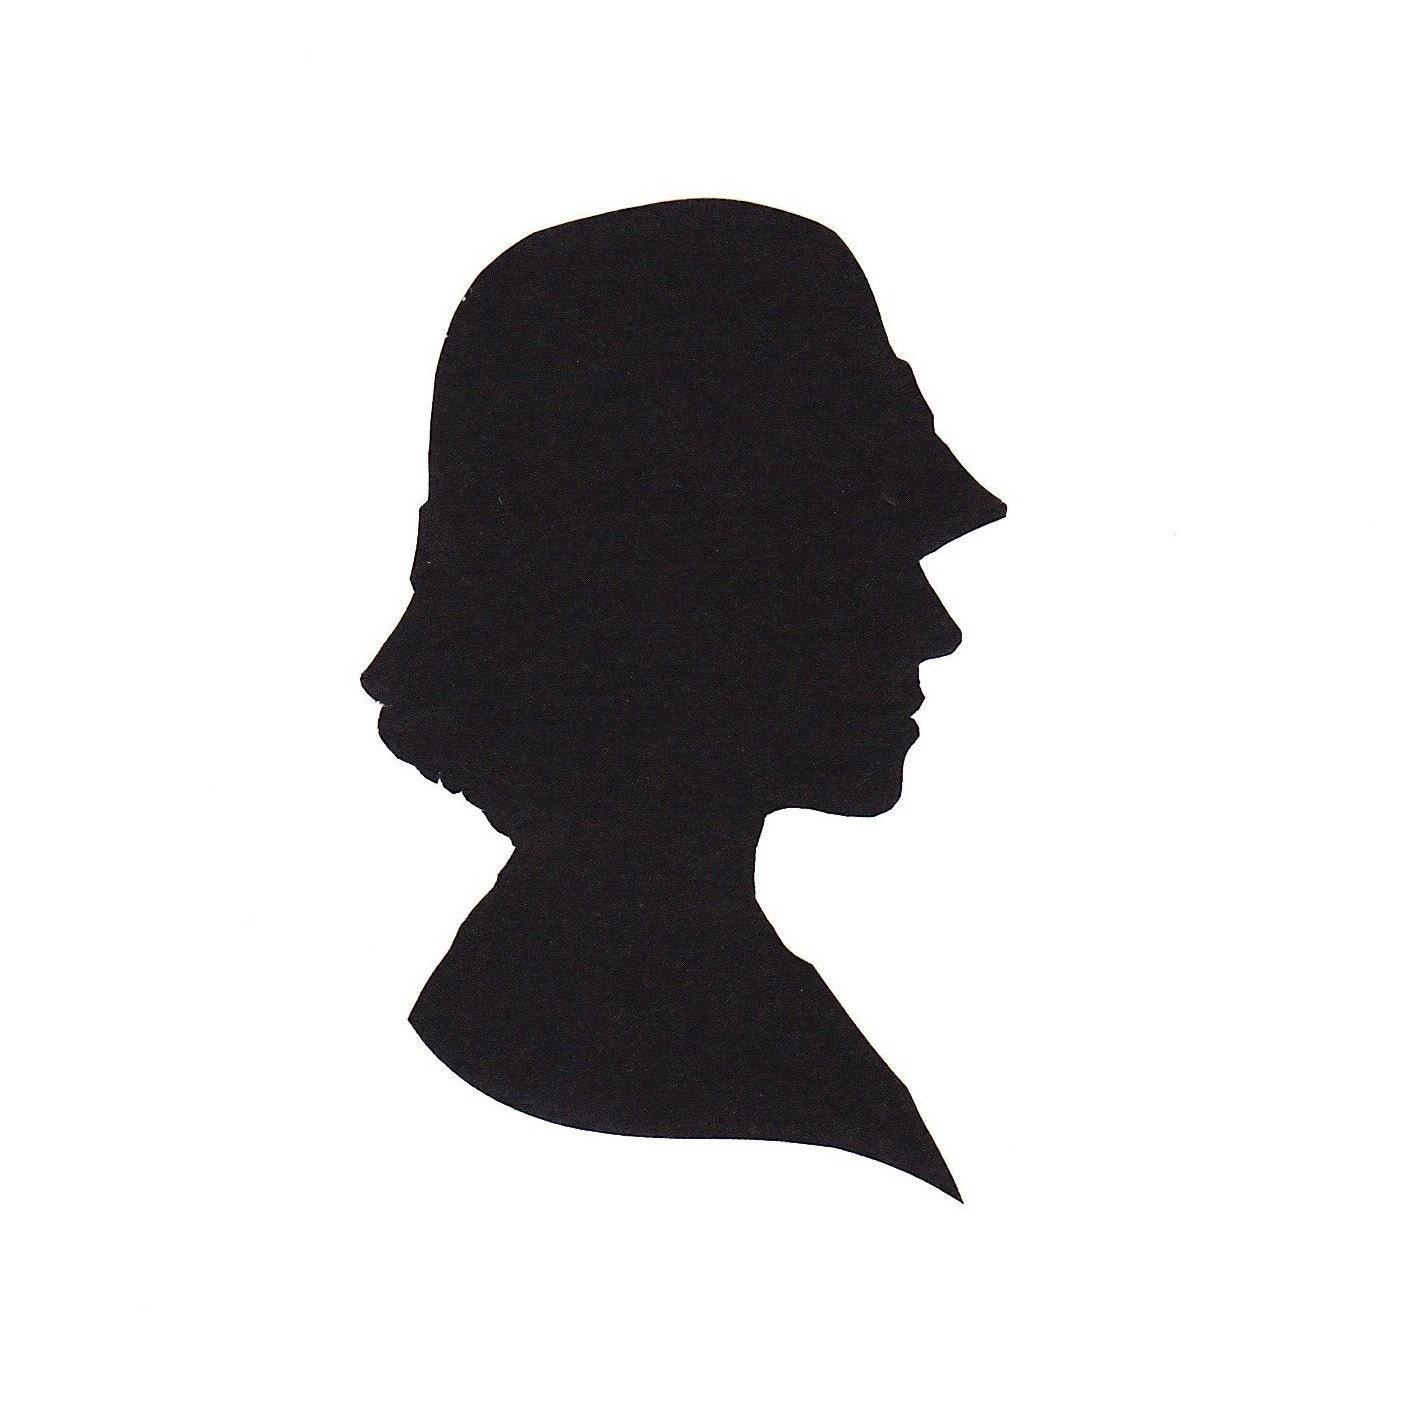 silhouette portrait papercutting. Black Bedroom Furniture Sets. Home Design Ideas